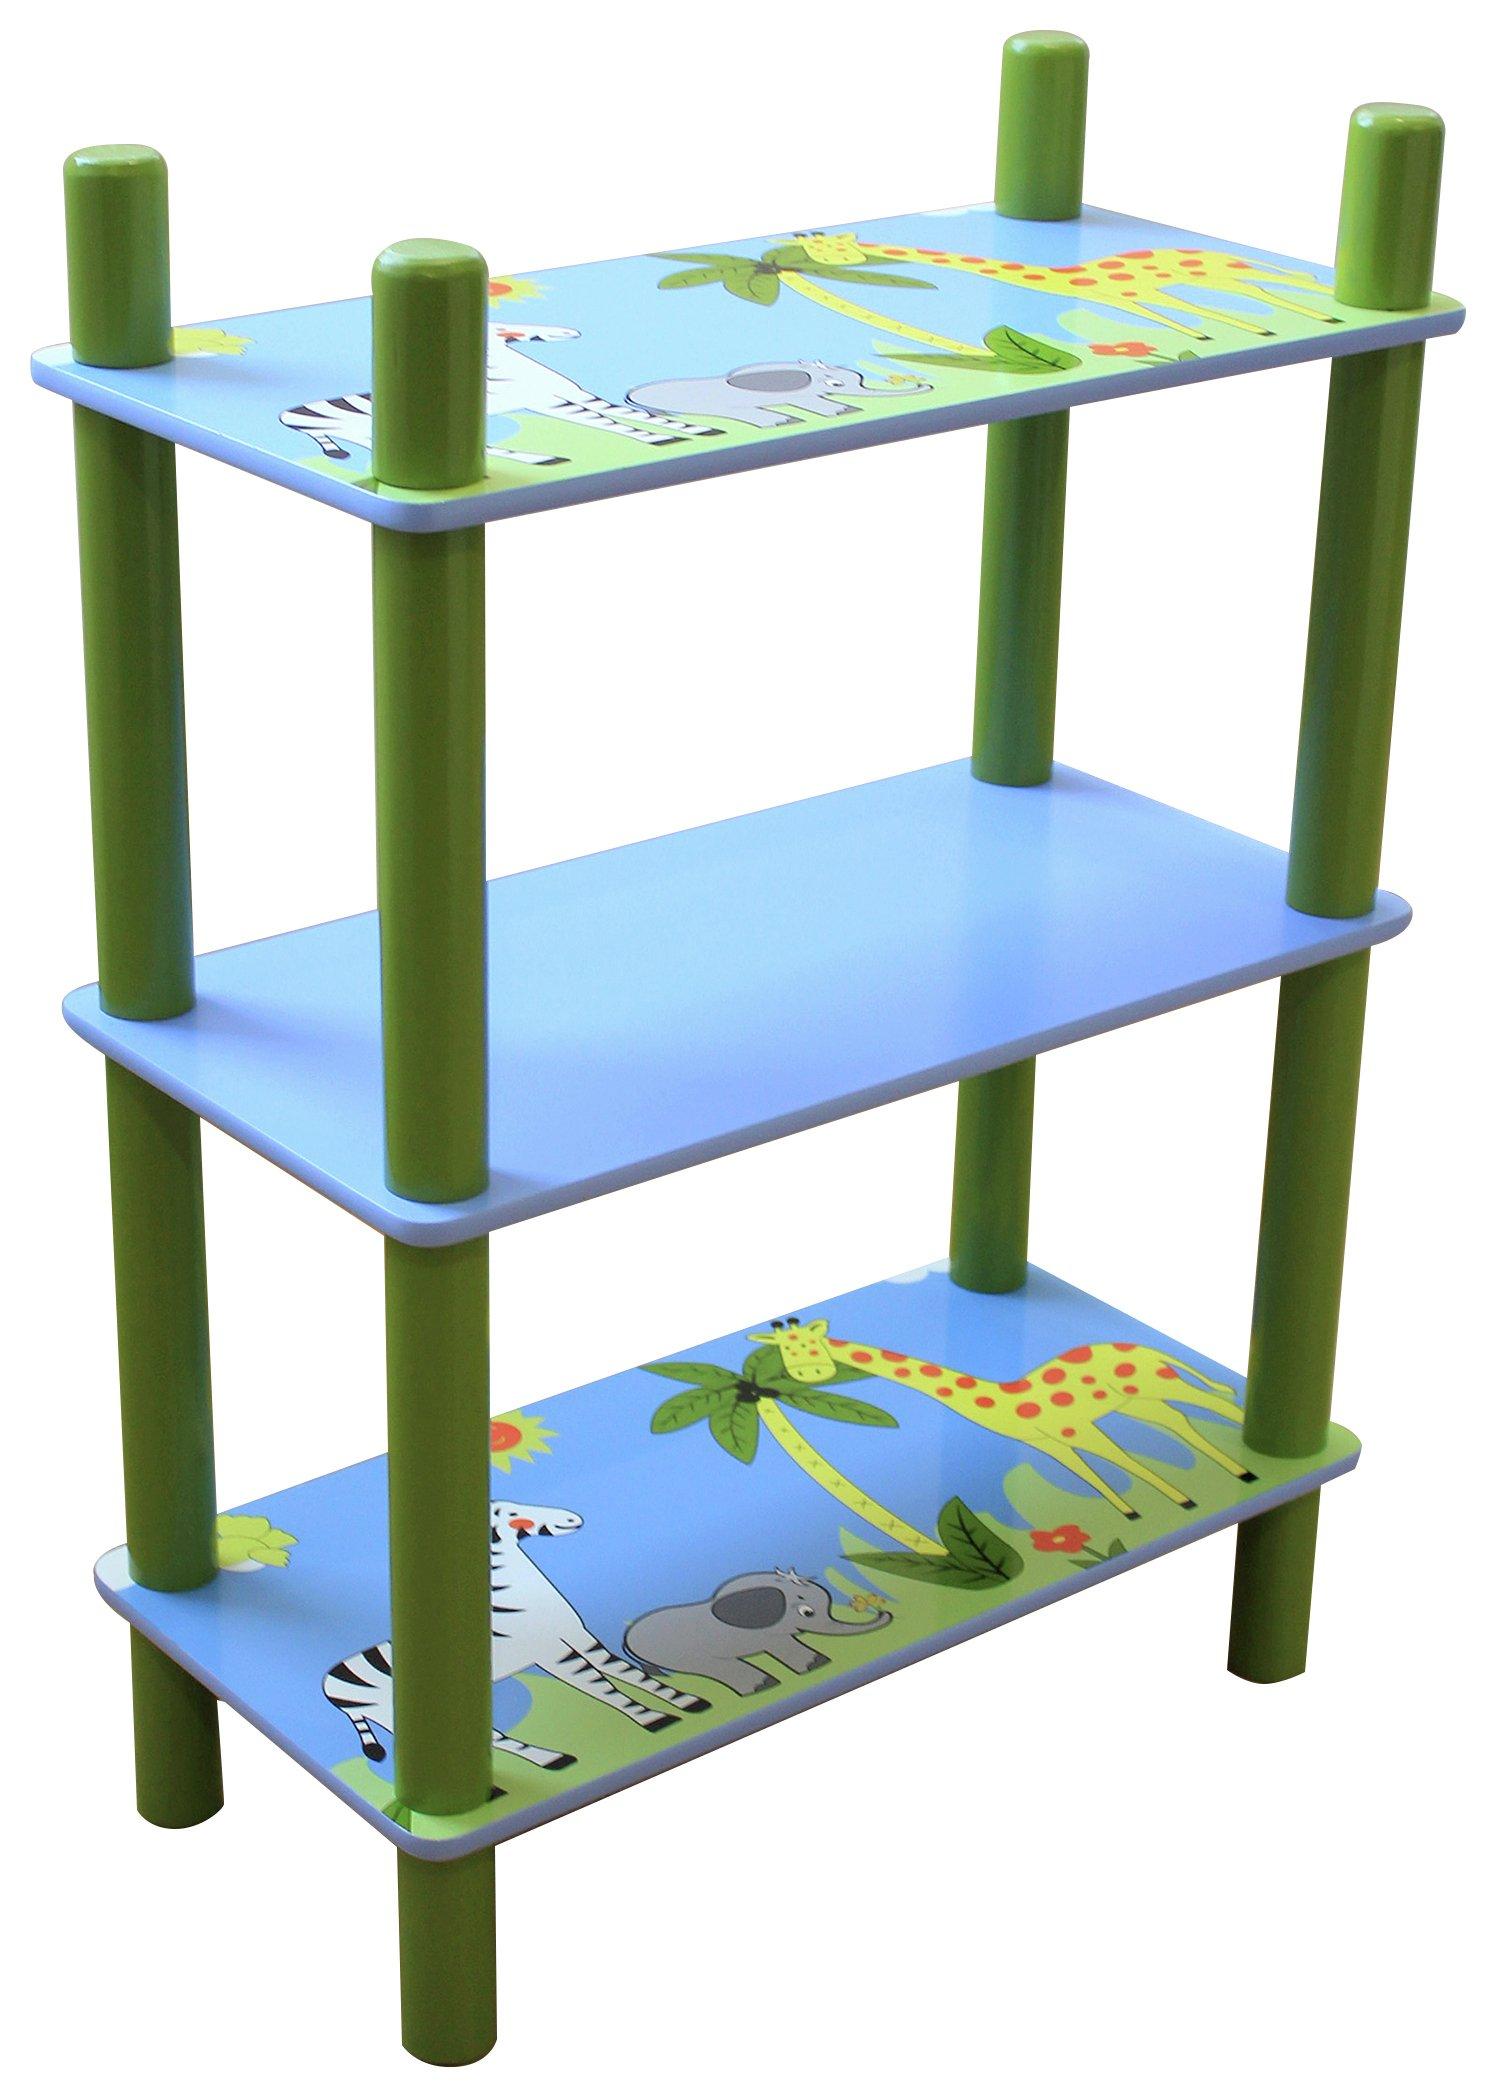 Image of Liberty House Safari Storage Shelves.